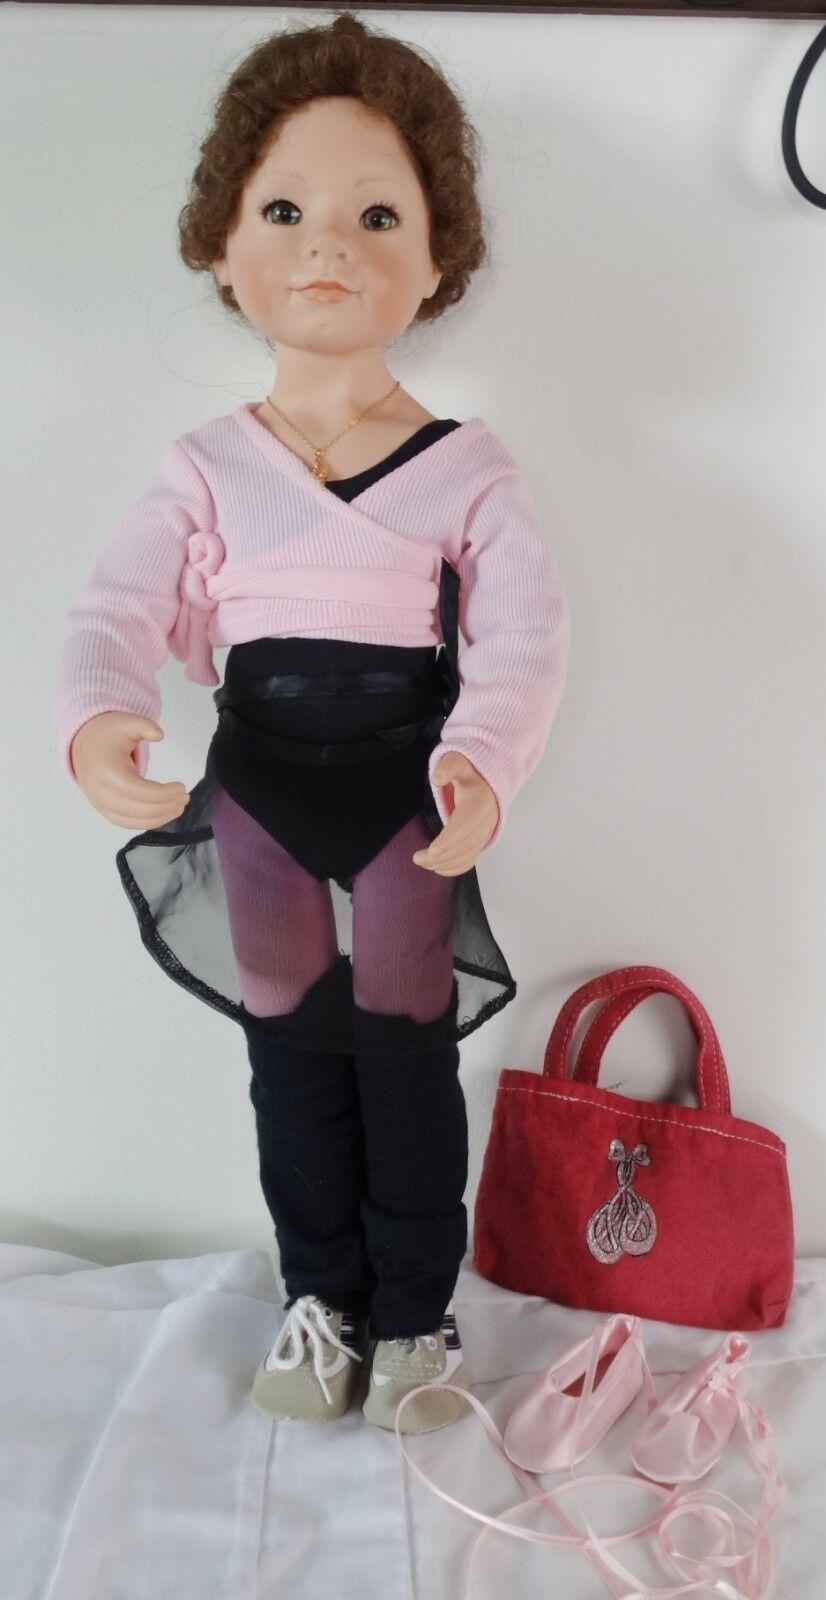 1994 Julie Good-Kruger Vinyl Puppe Ballett Klasse Ballerina 21